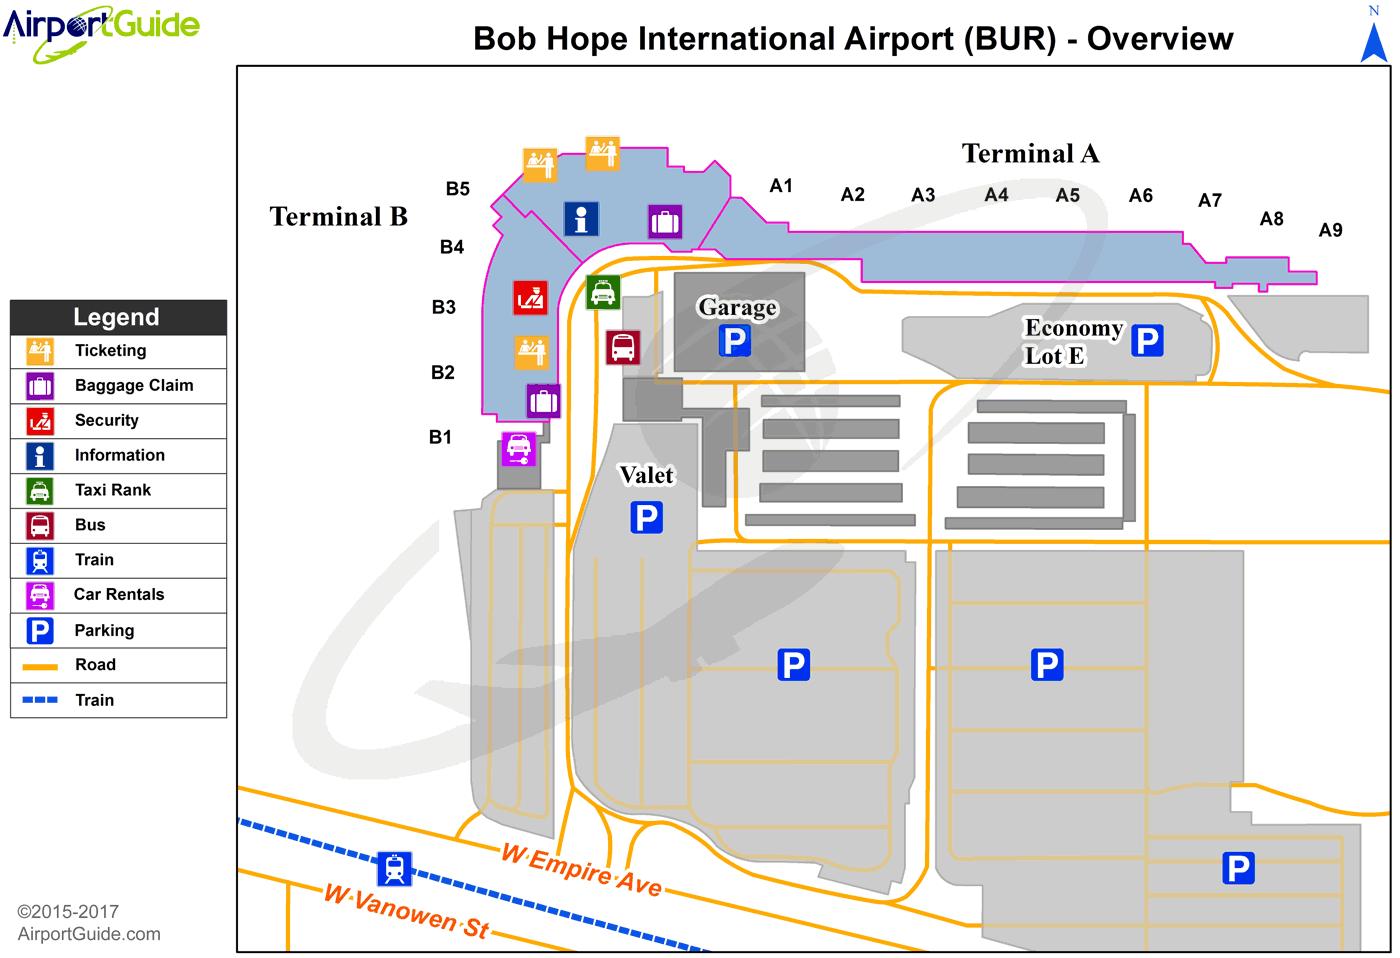 Burbank Bob Hope Bur Airport Terminal Map Overview